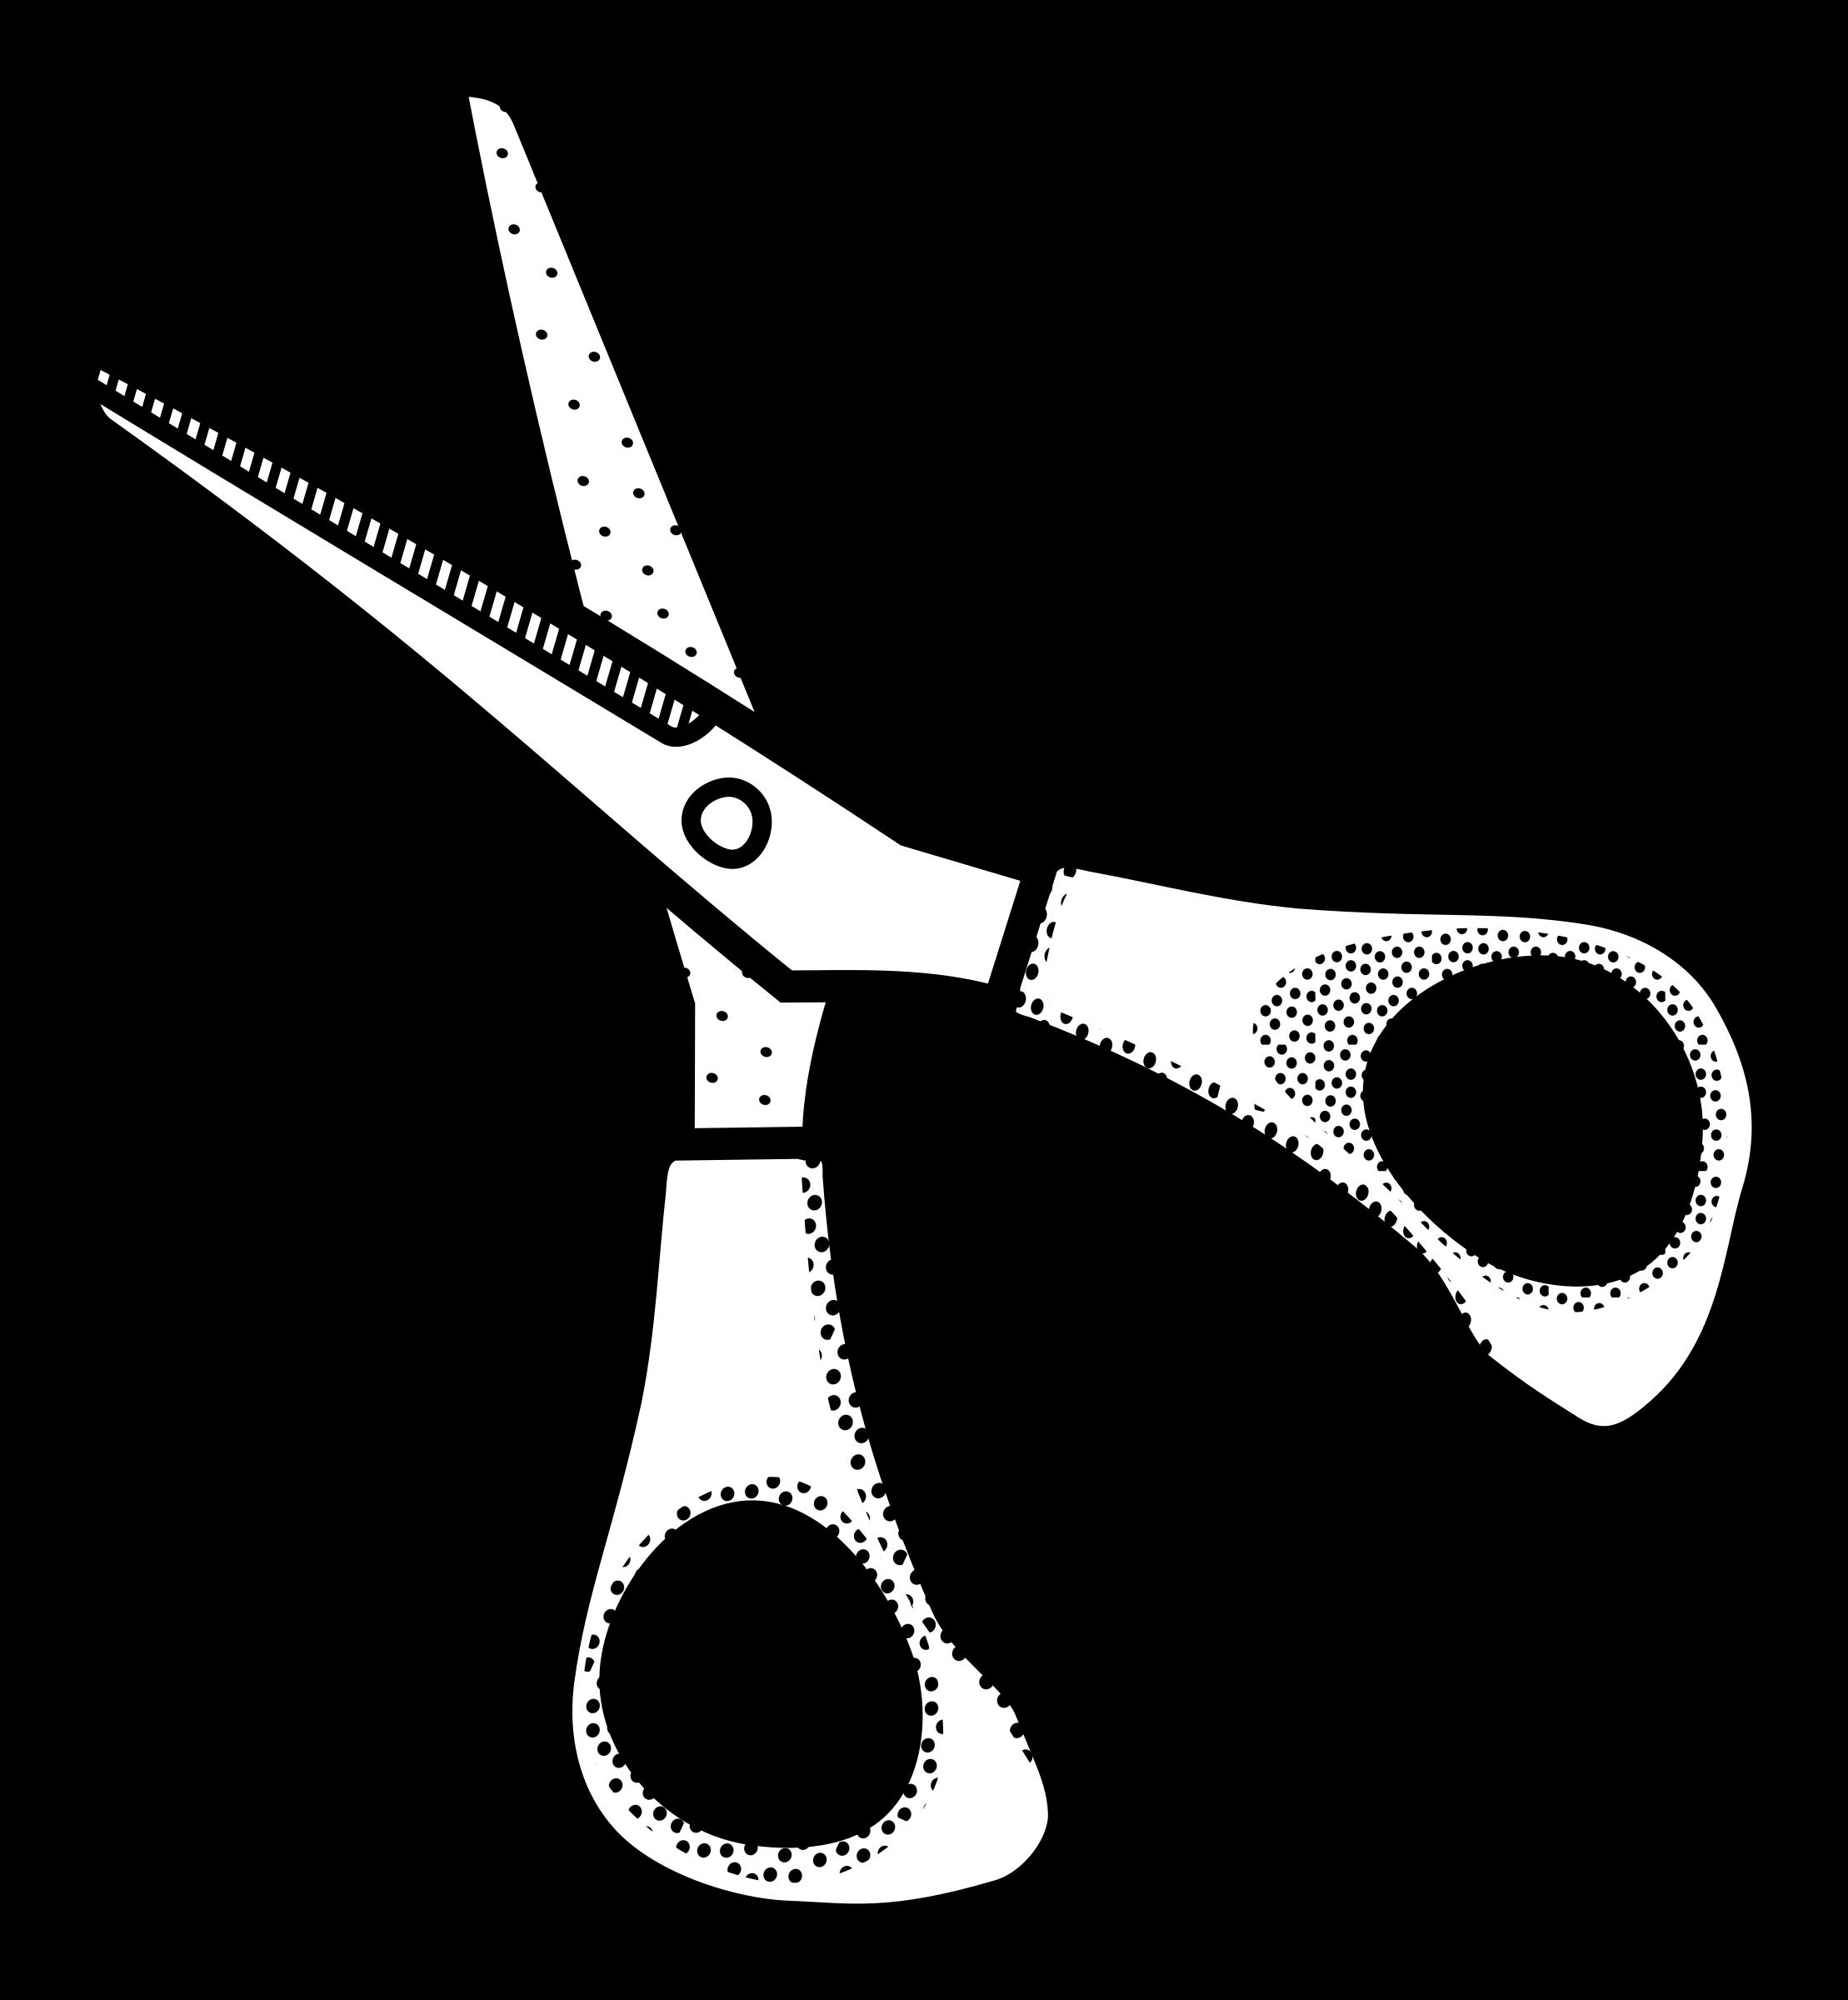 Clipart scissors craft scissors. Lineart big image png